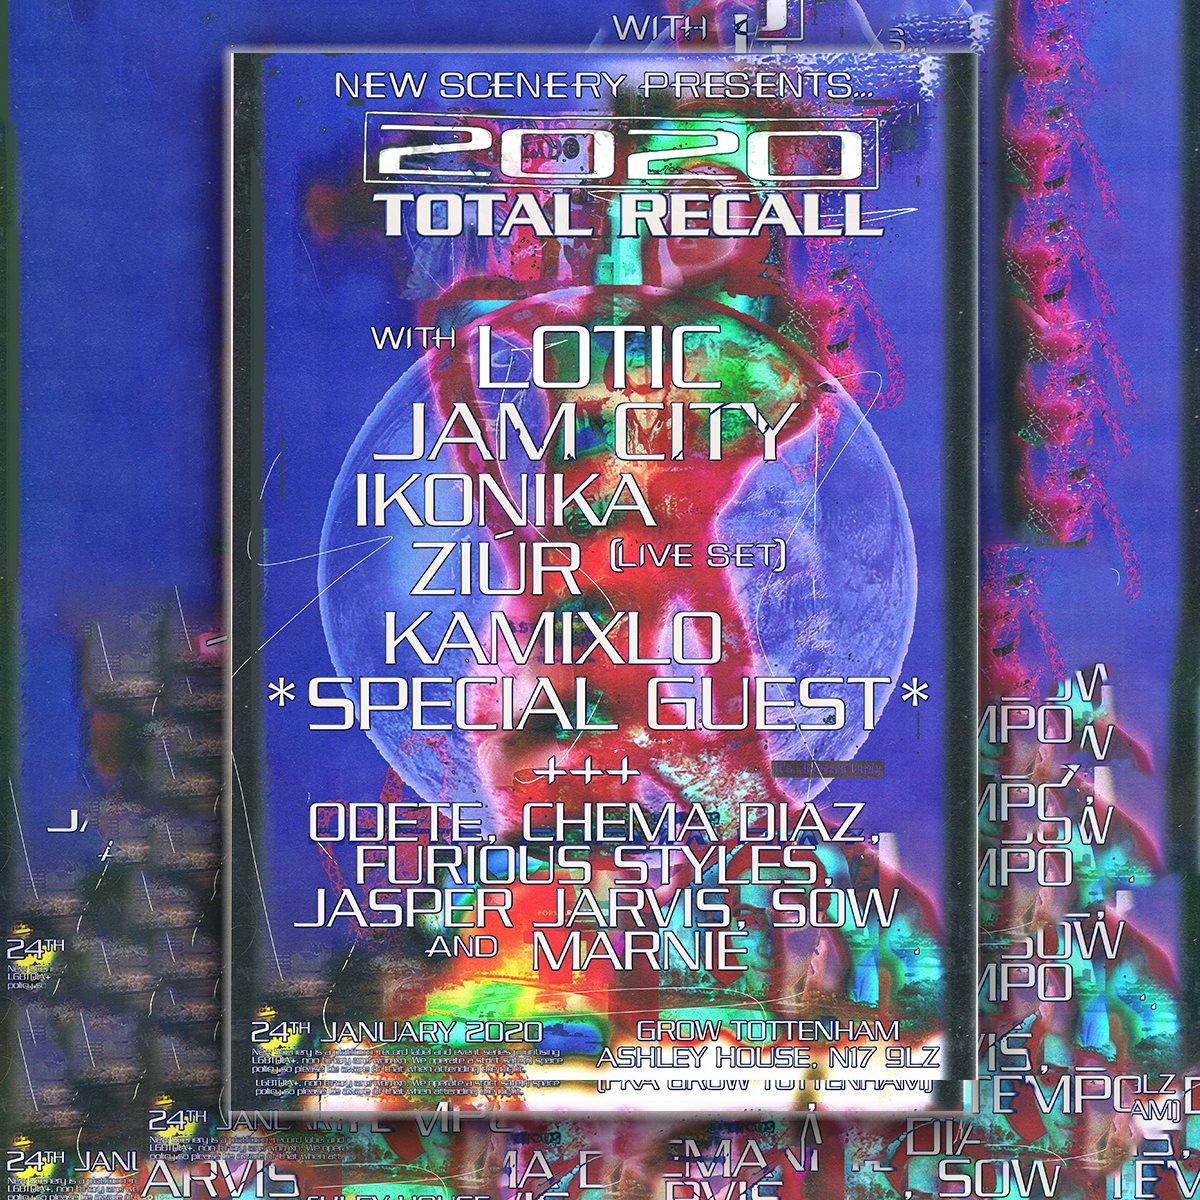 Total Recall 2020: Lotic, Jam City, Ikonika, Ziur (Live), Kablam, Odete, Chema Diaz & NS - Flyer front